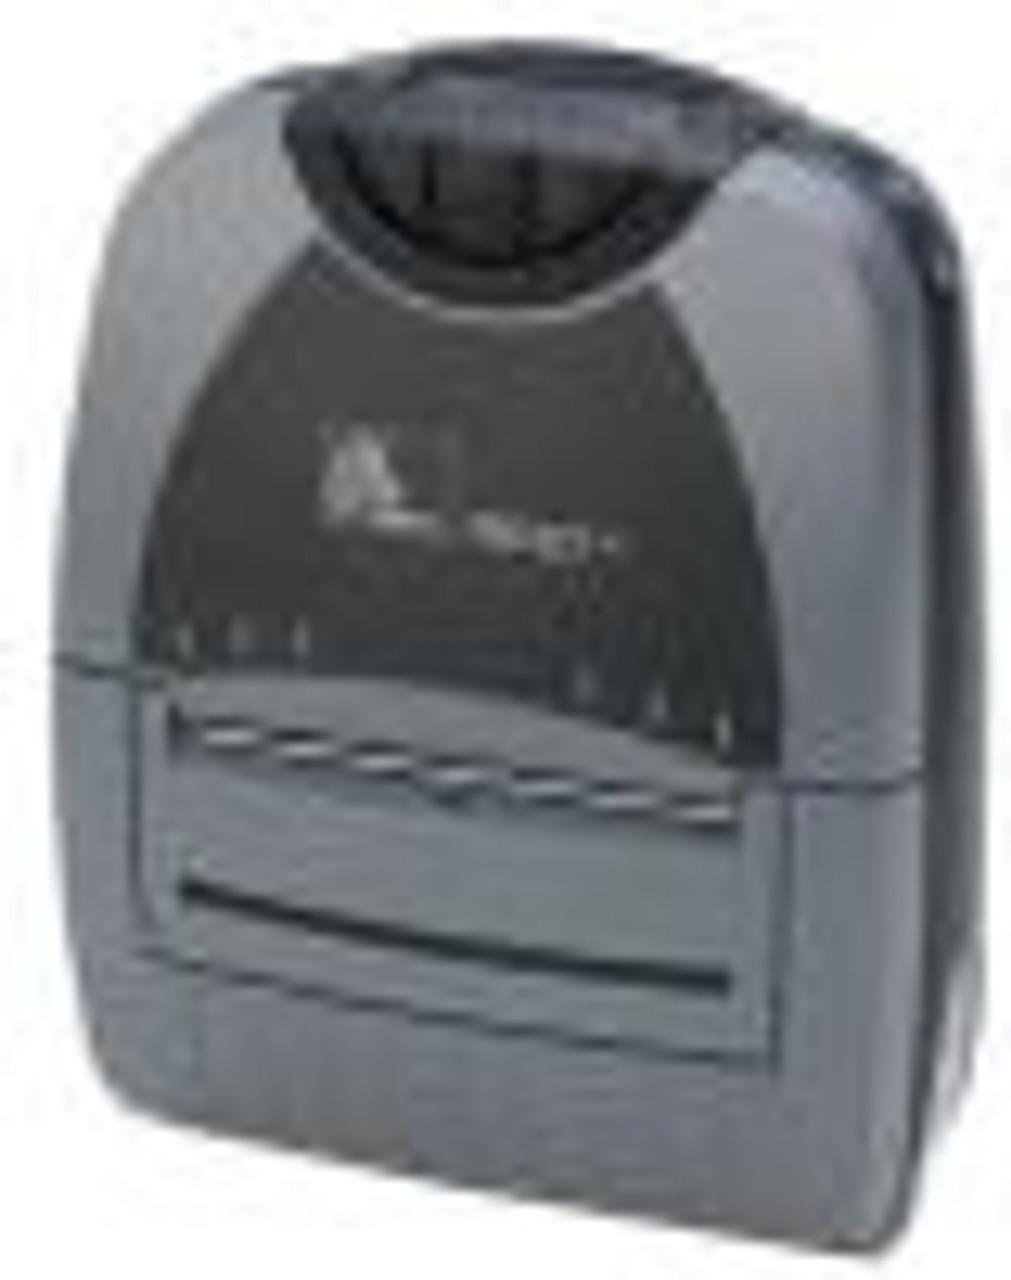 RP4T Printers